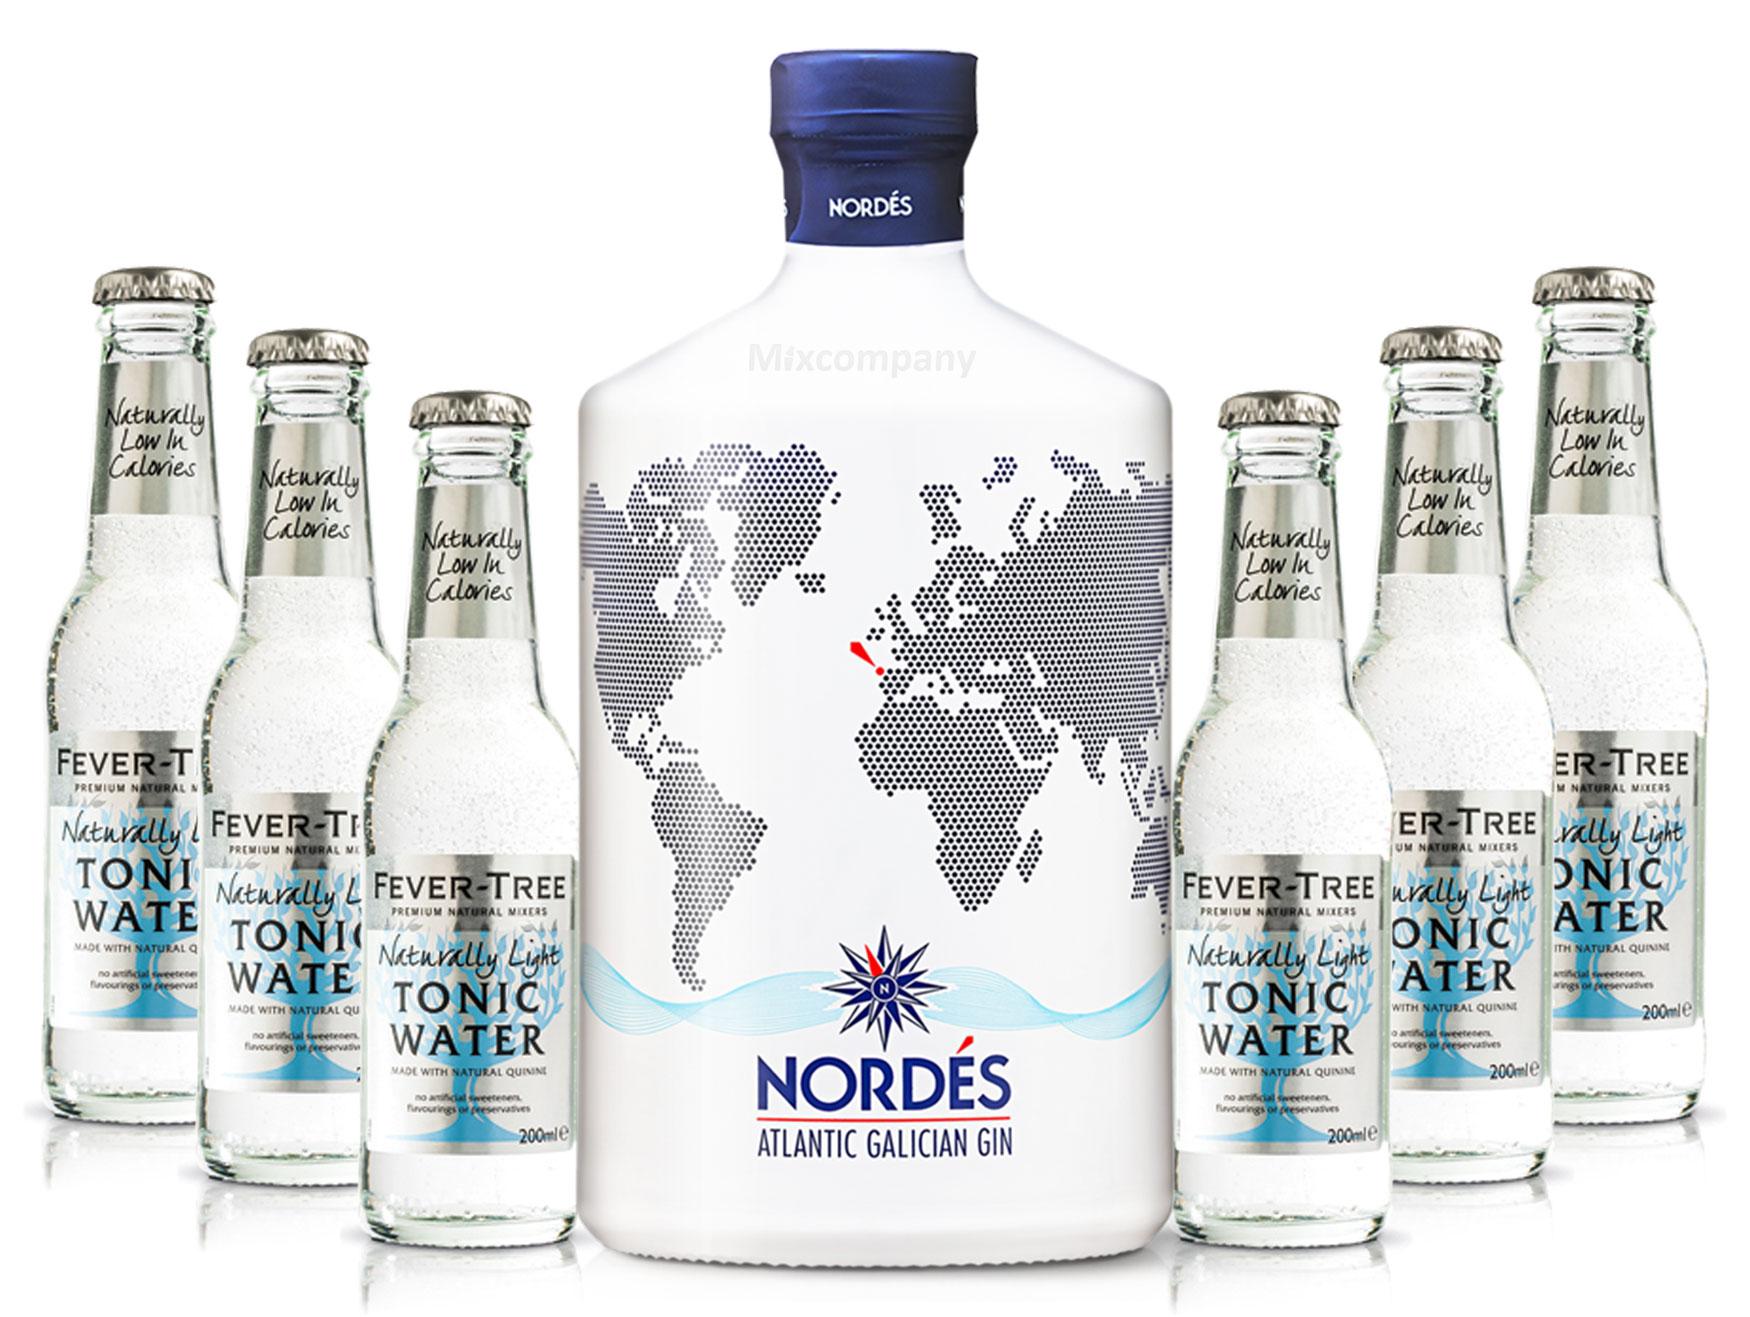 Nordes Atlantic Galician Gin aus Galizien 0,7l (40% Vol) + 6x FEVER-TREE Naturally Light Indian Tonic Water 0,2l MEHRWEG inkl. Pfand- [Enthält Sulfite]